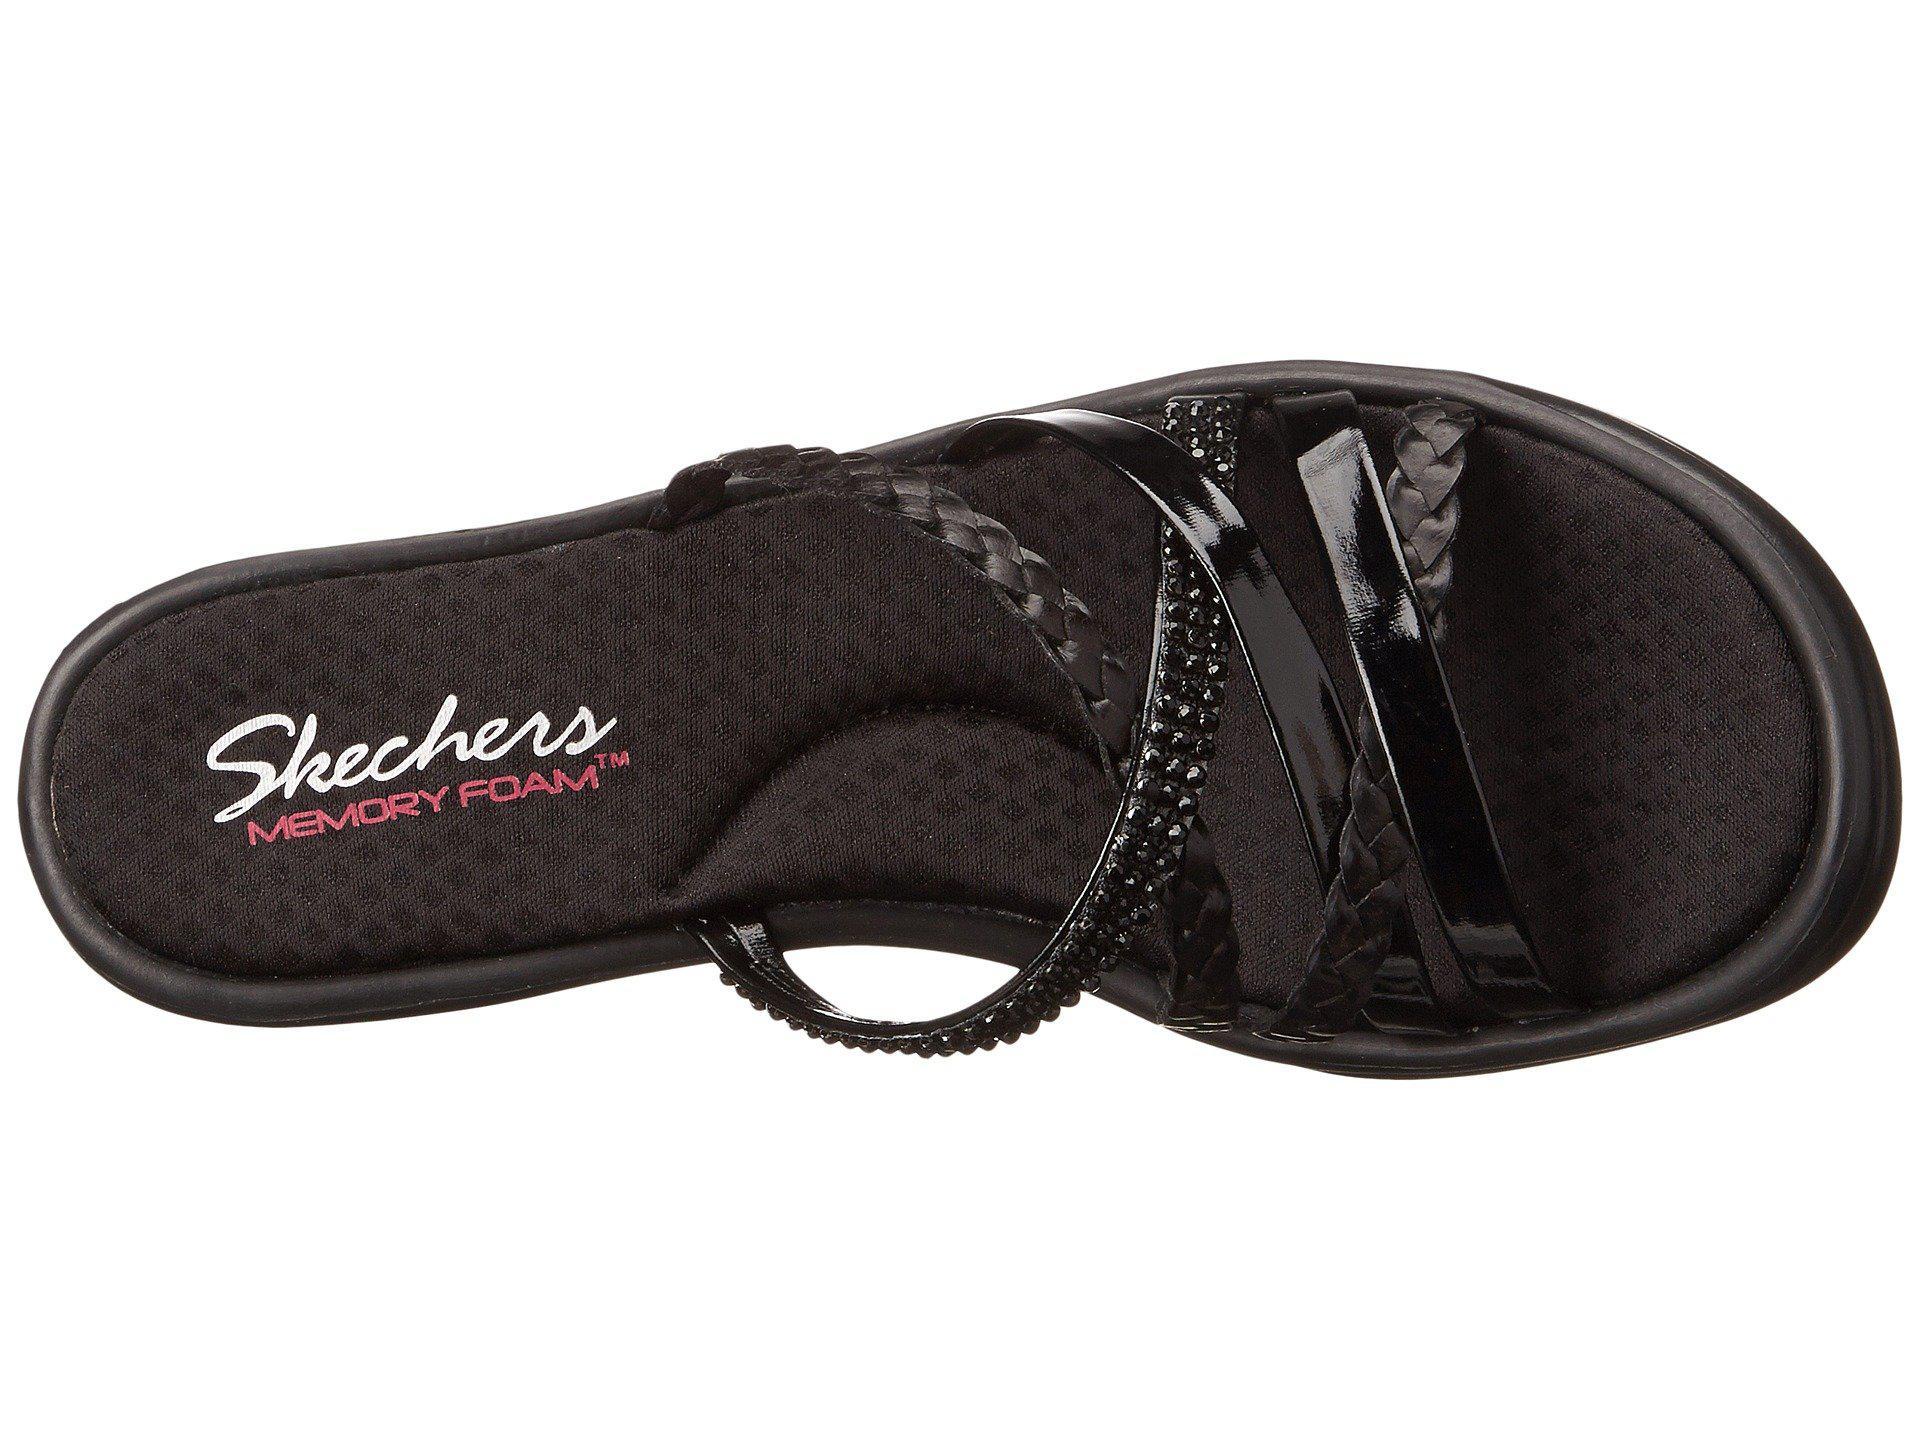 3f17c46155c7 Skechers - Cali - Rumblers - Wild Child (black black) Women s Sandals -.  View fullscreen